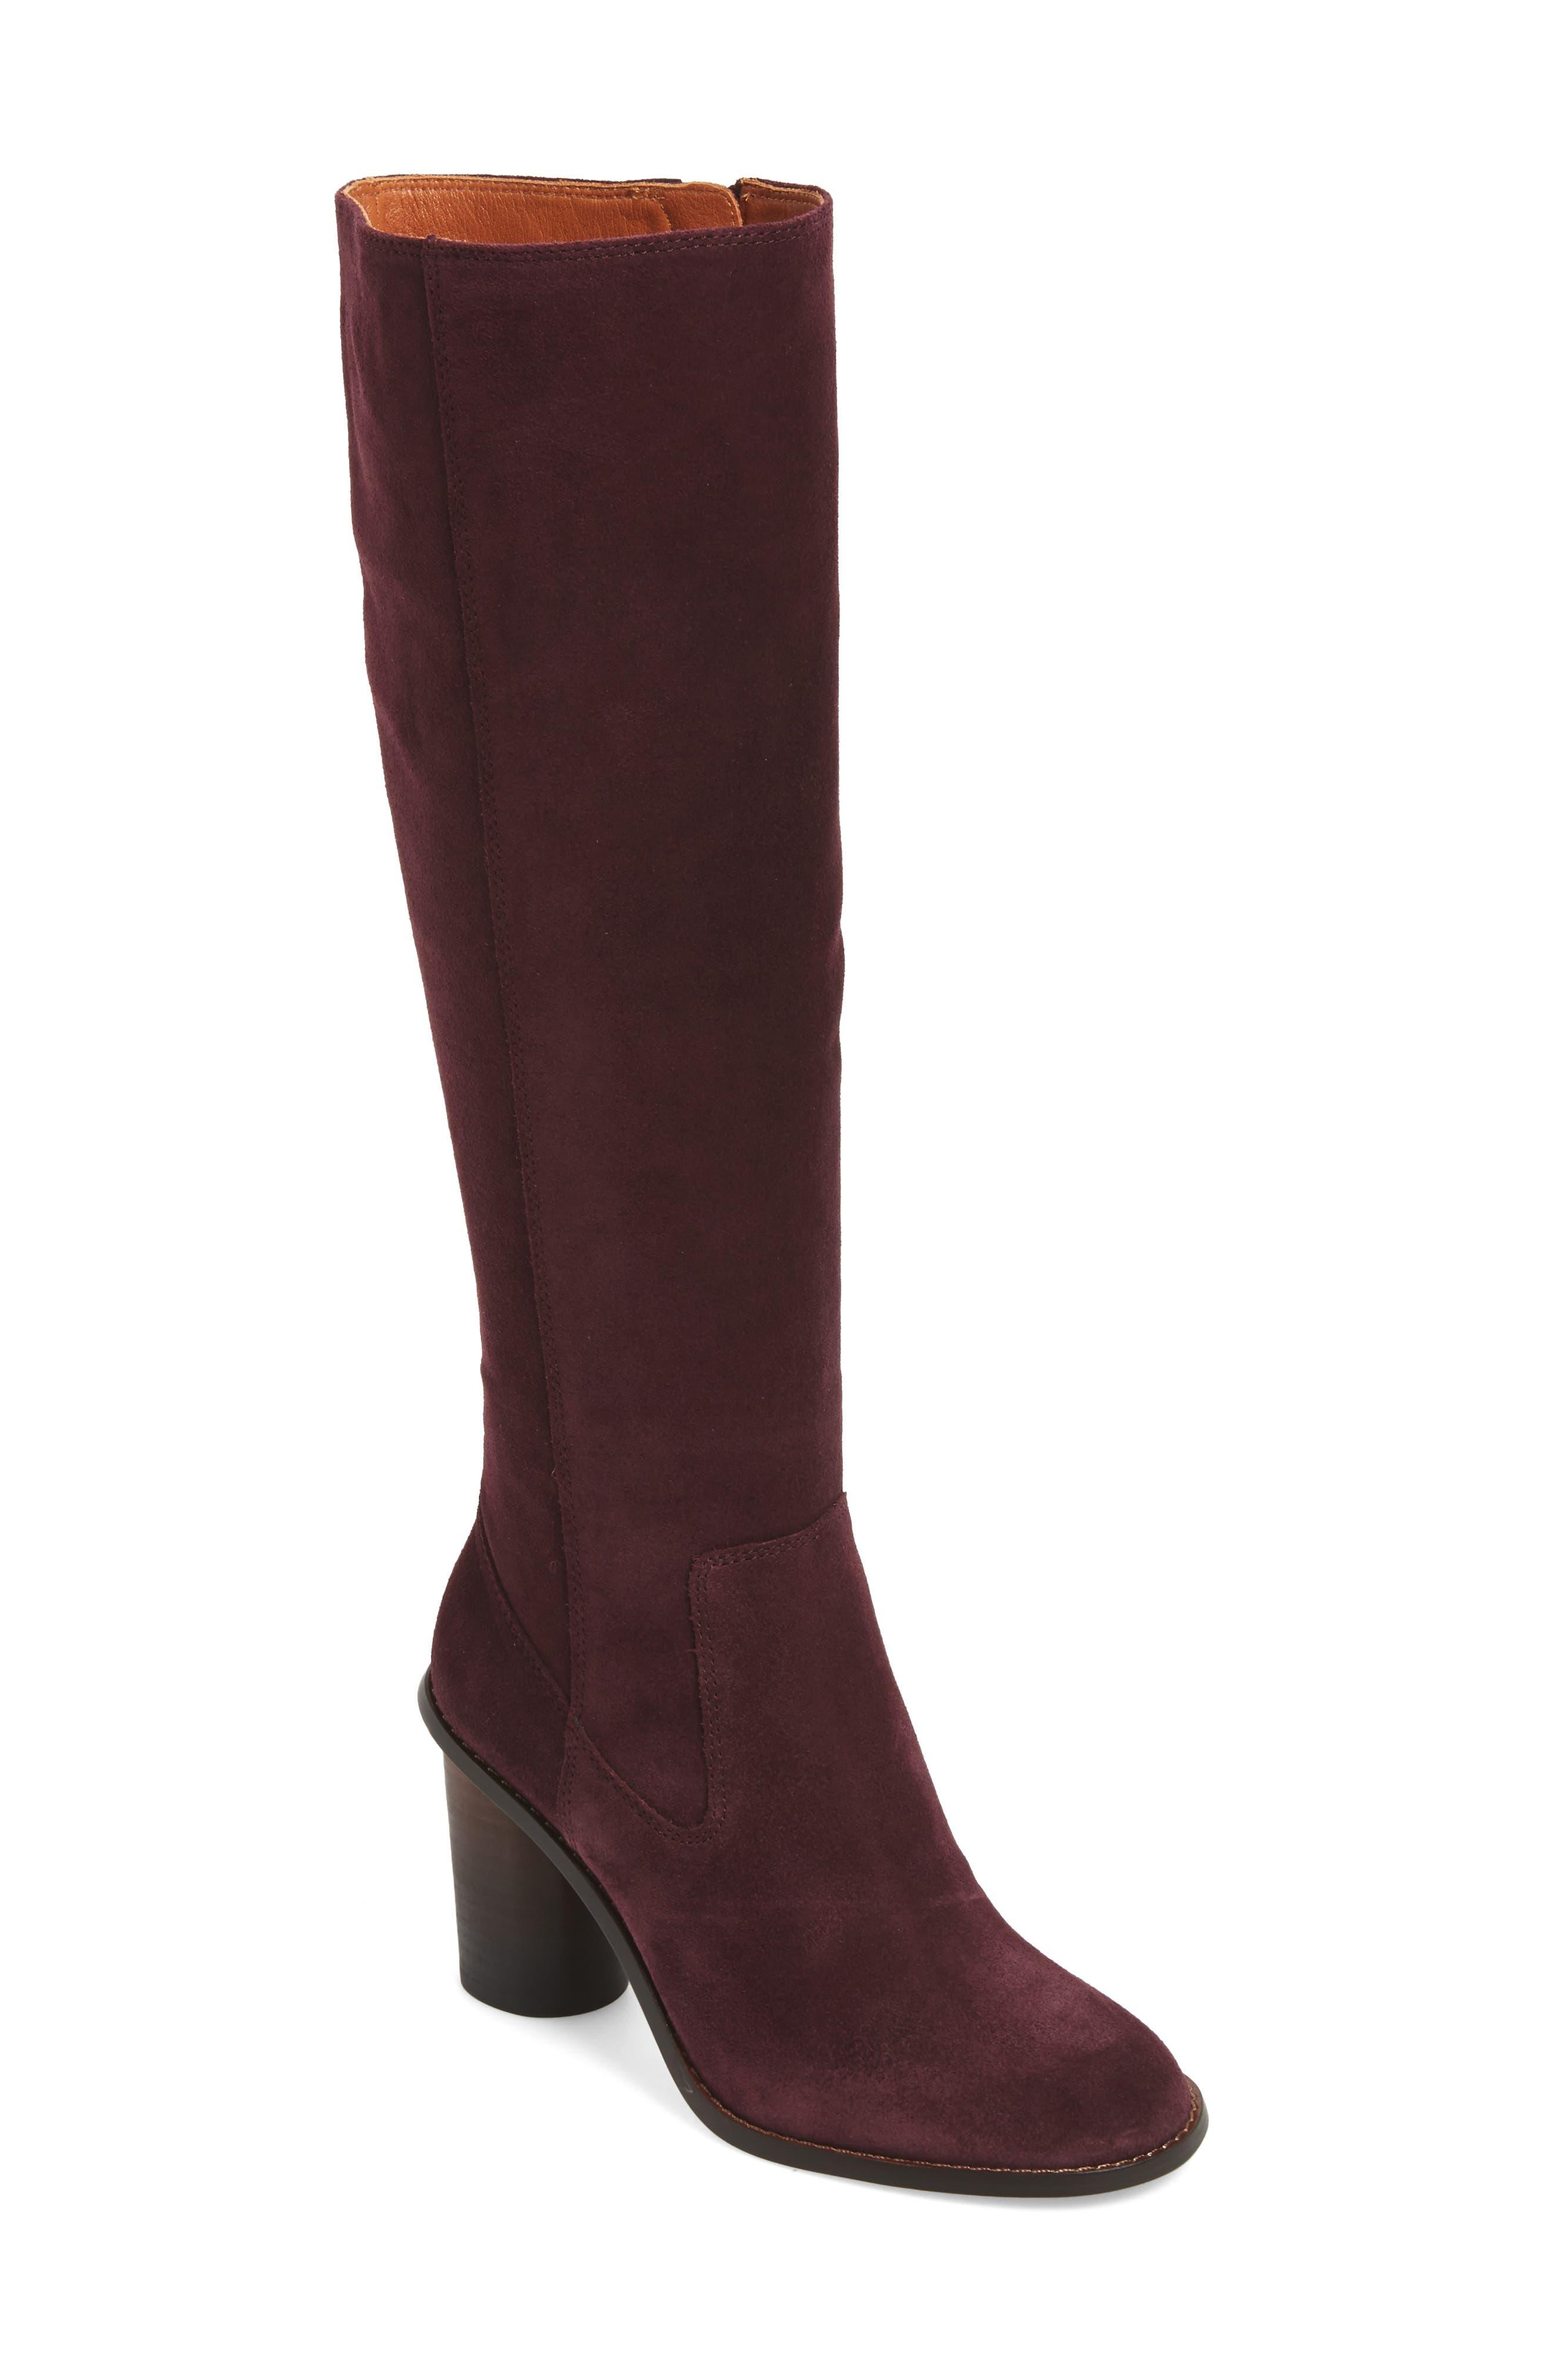 Alternate Image 1 Selected - COACH Ombré Knee High Boot (Women)